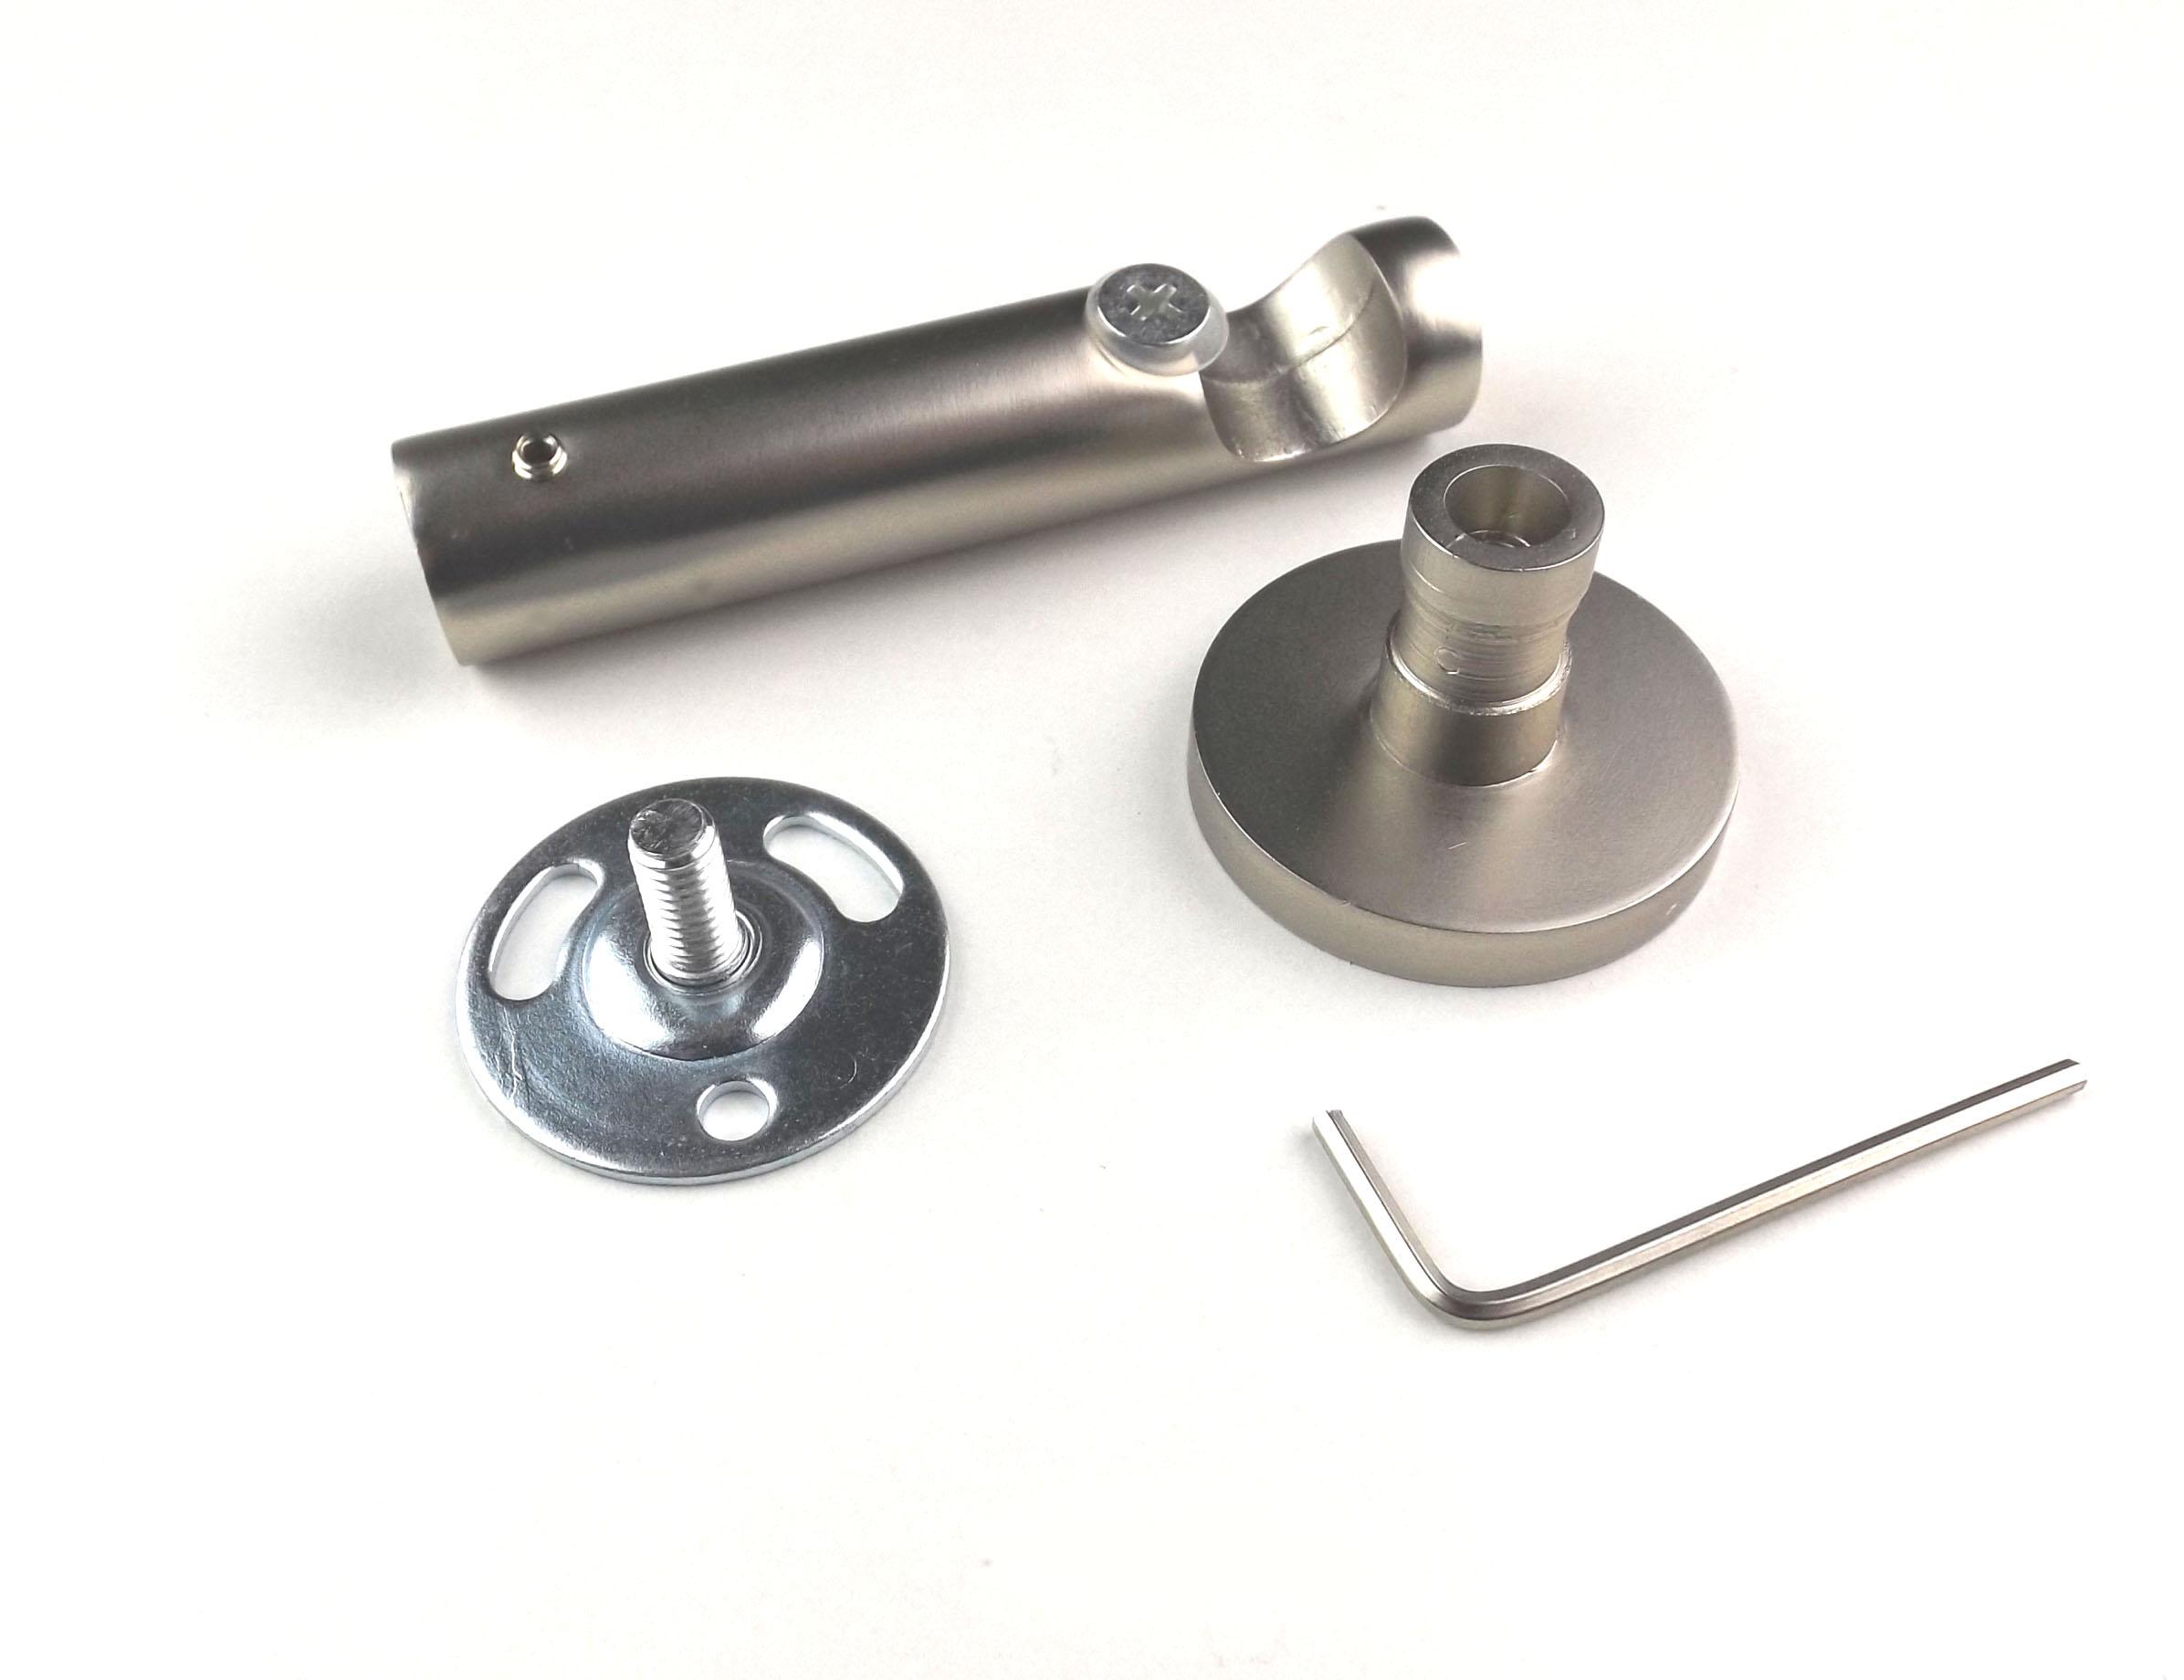 Modern karnistartó konzol 1 rudas 16 mm-es karnishoz nikkel színben - www.karnisstudio.hu